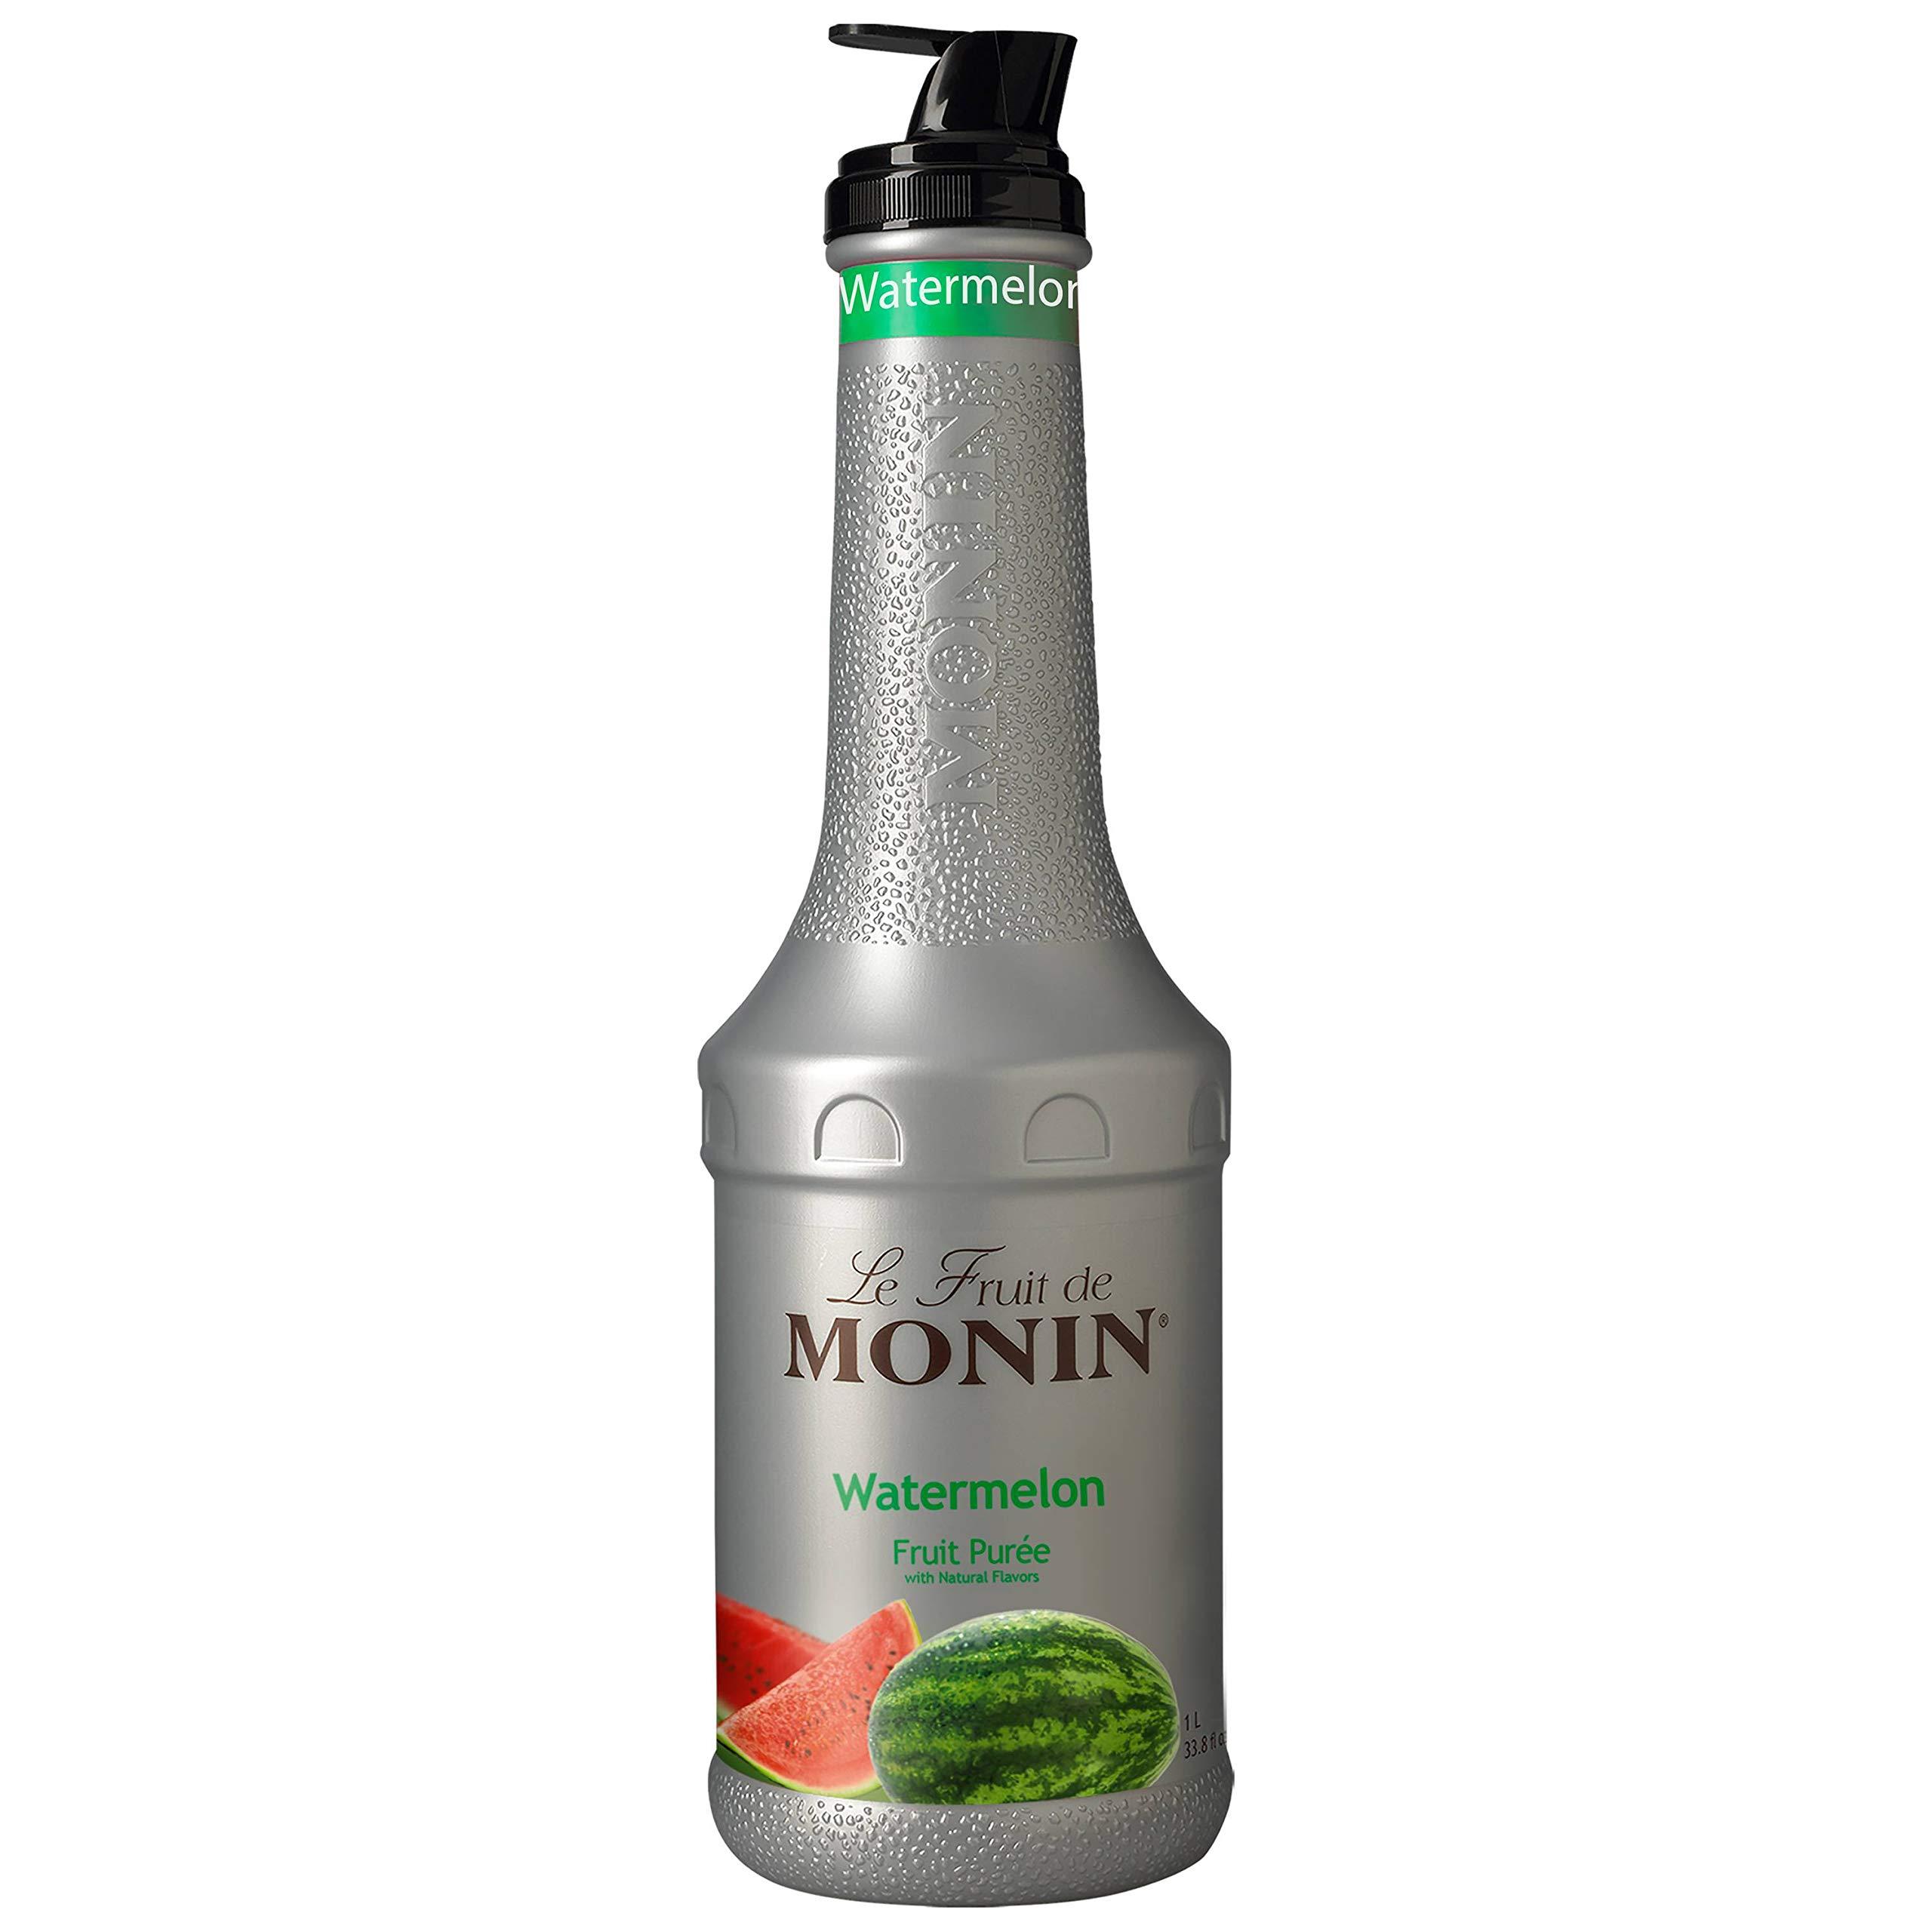 Monin Watermelon Puree, 1 Liter -- 4 per case.